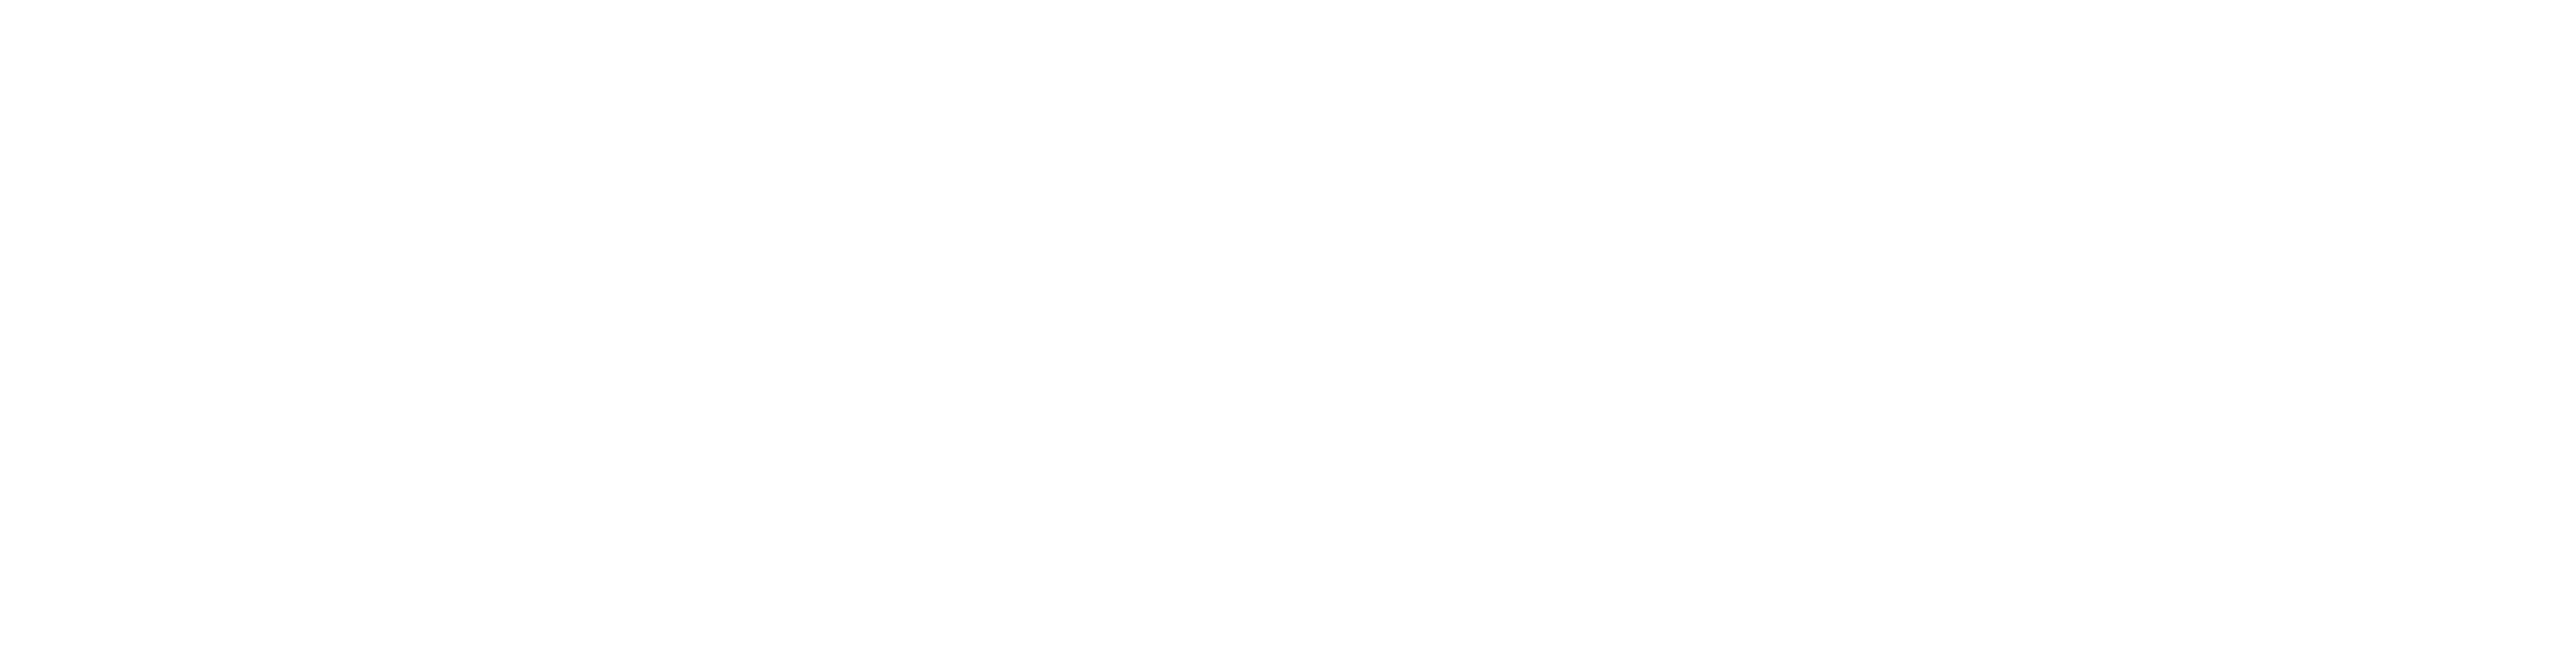 Cyberint white logo